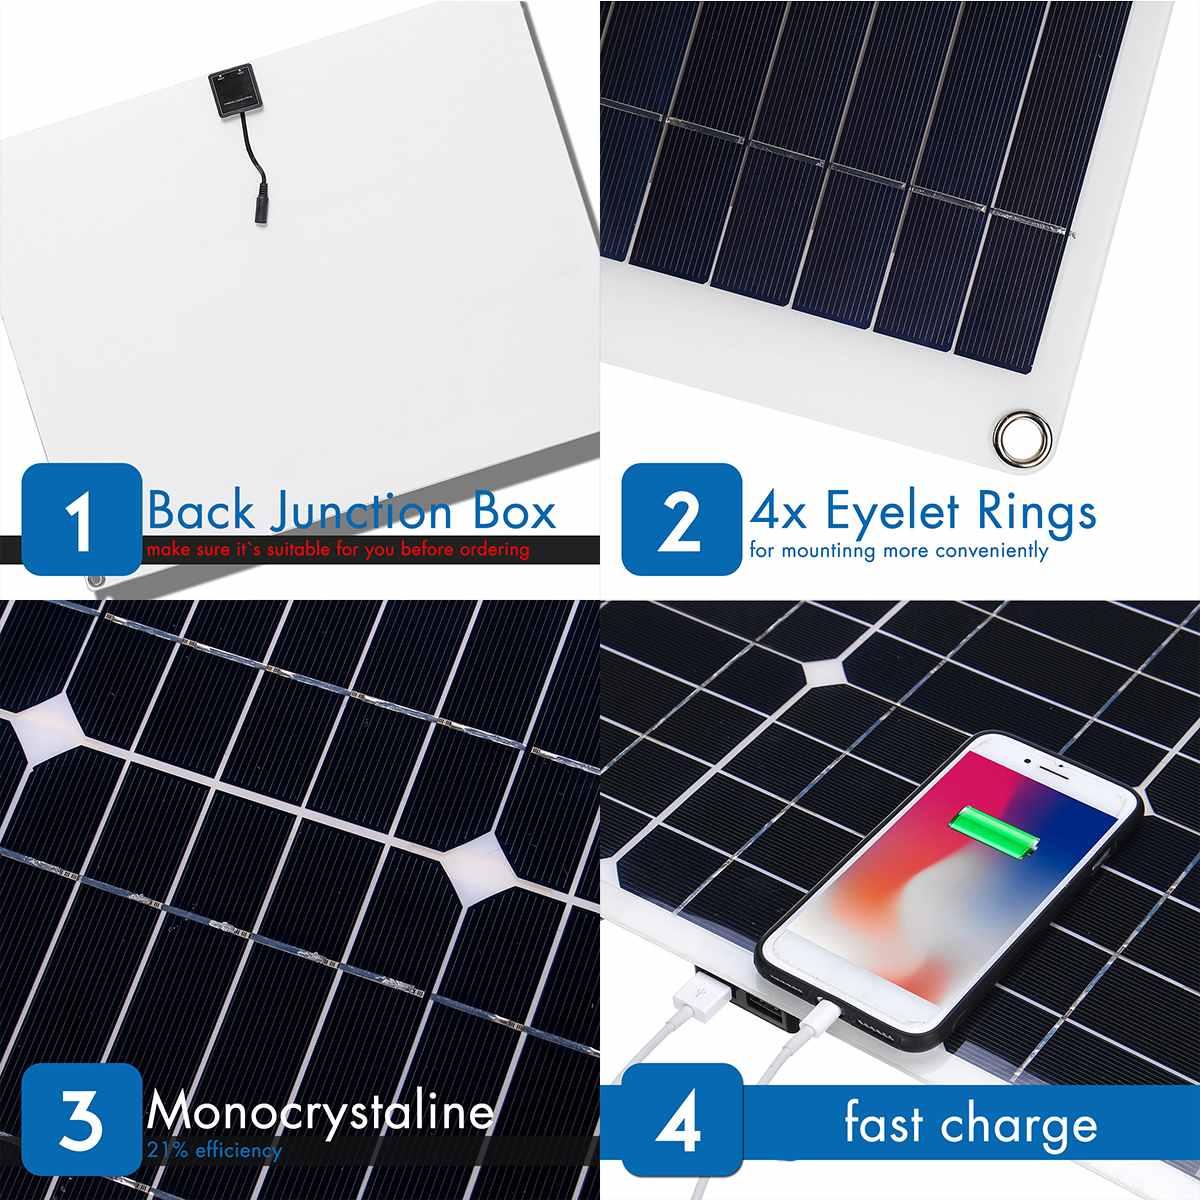 Nuevo Panel Solar de 200W 18V 5V Flexible de silicio monocristalino con controlador de 10/20/30A para batería Solar al aire libre - 4